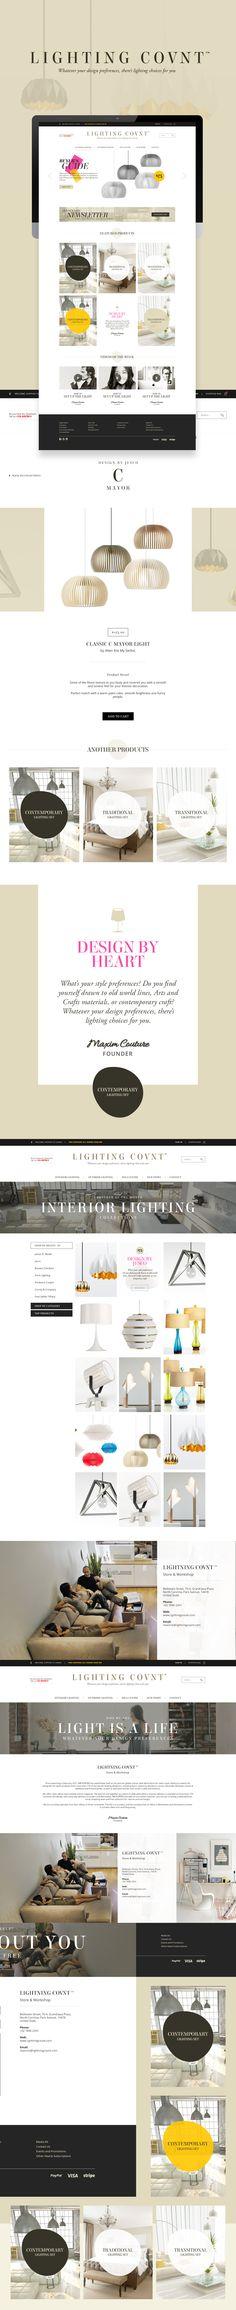 https://www.behance.net/gallery/16358901/Lighting-Covnt-Web-Interface